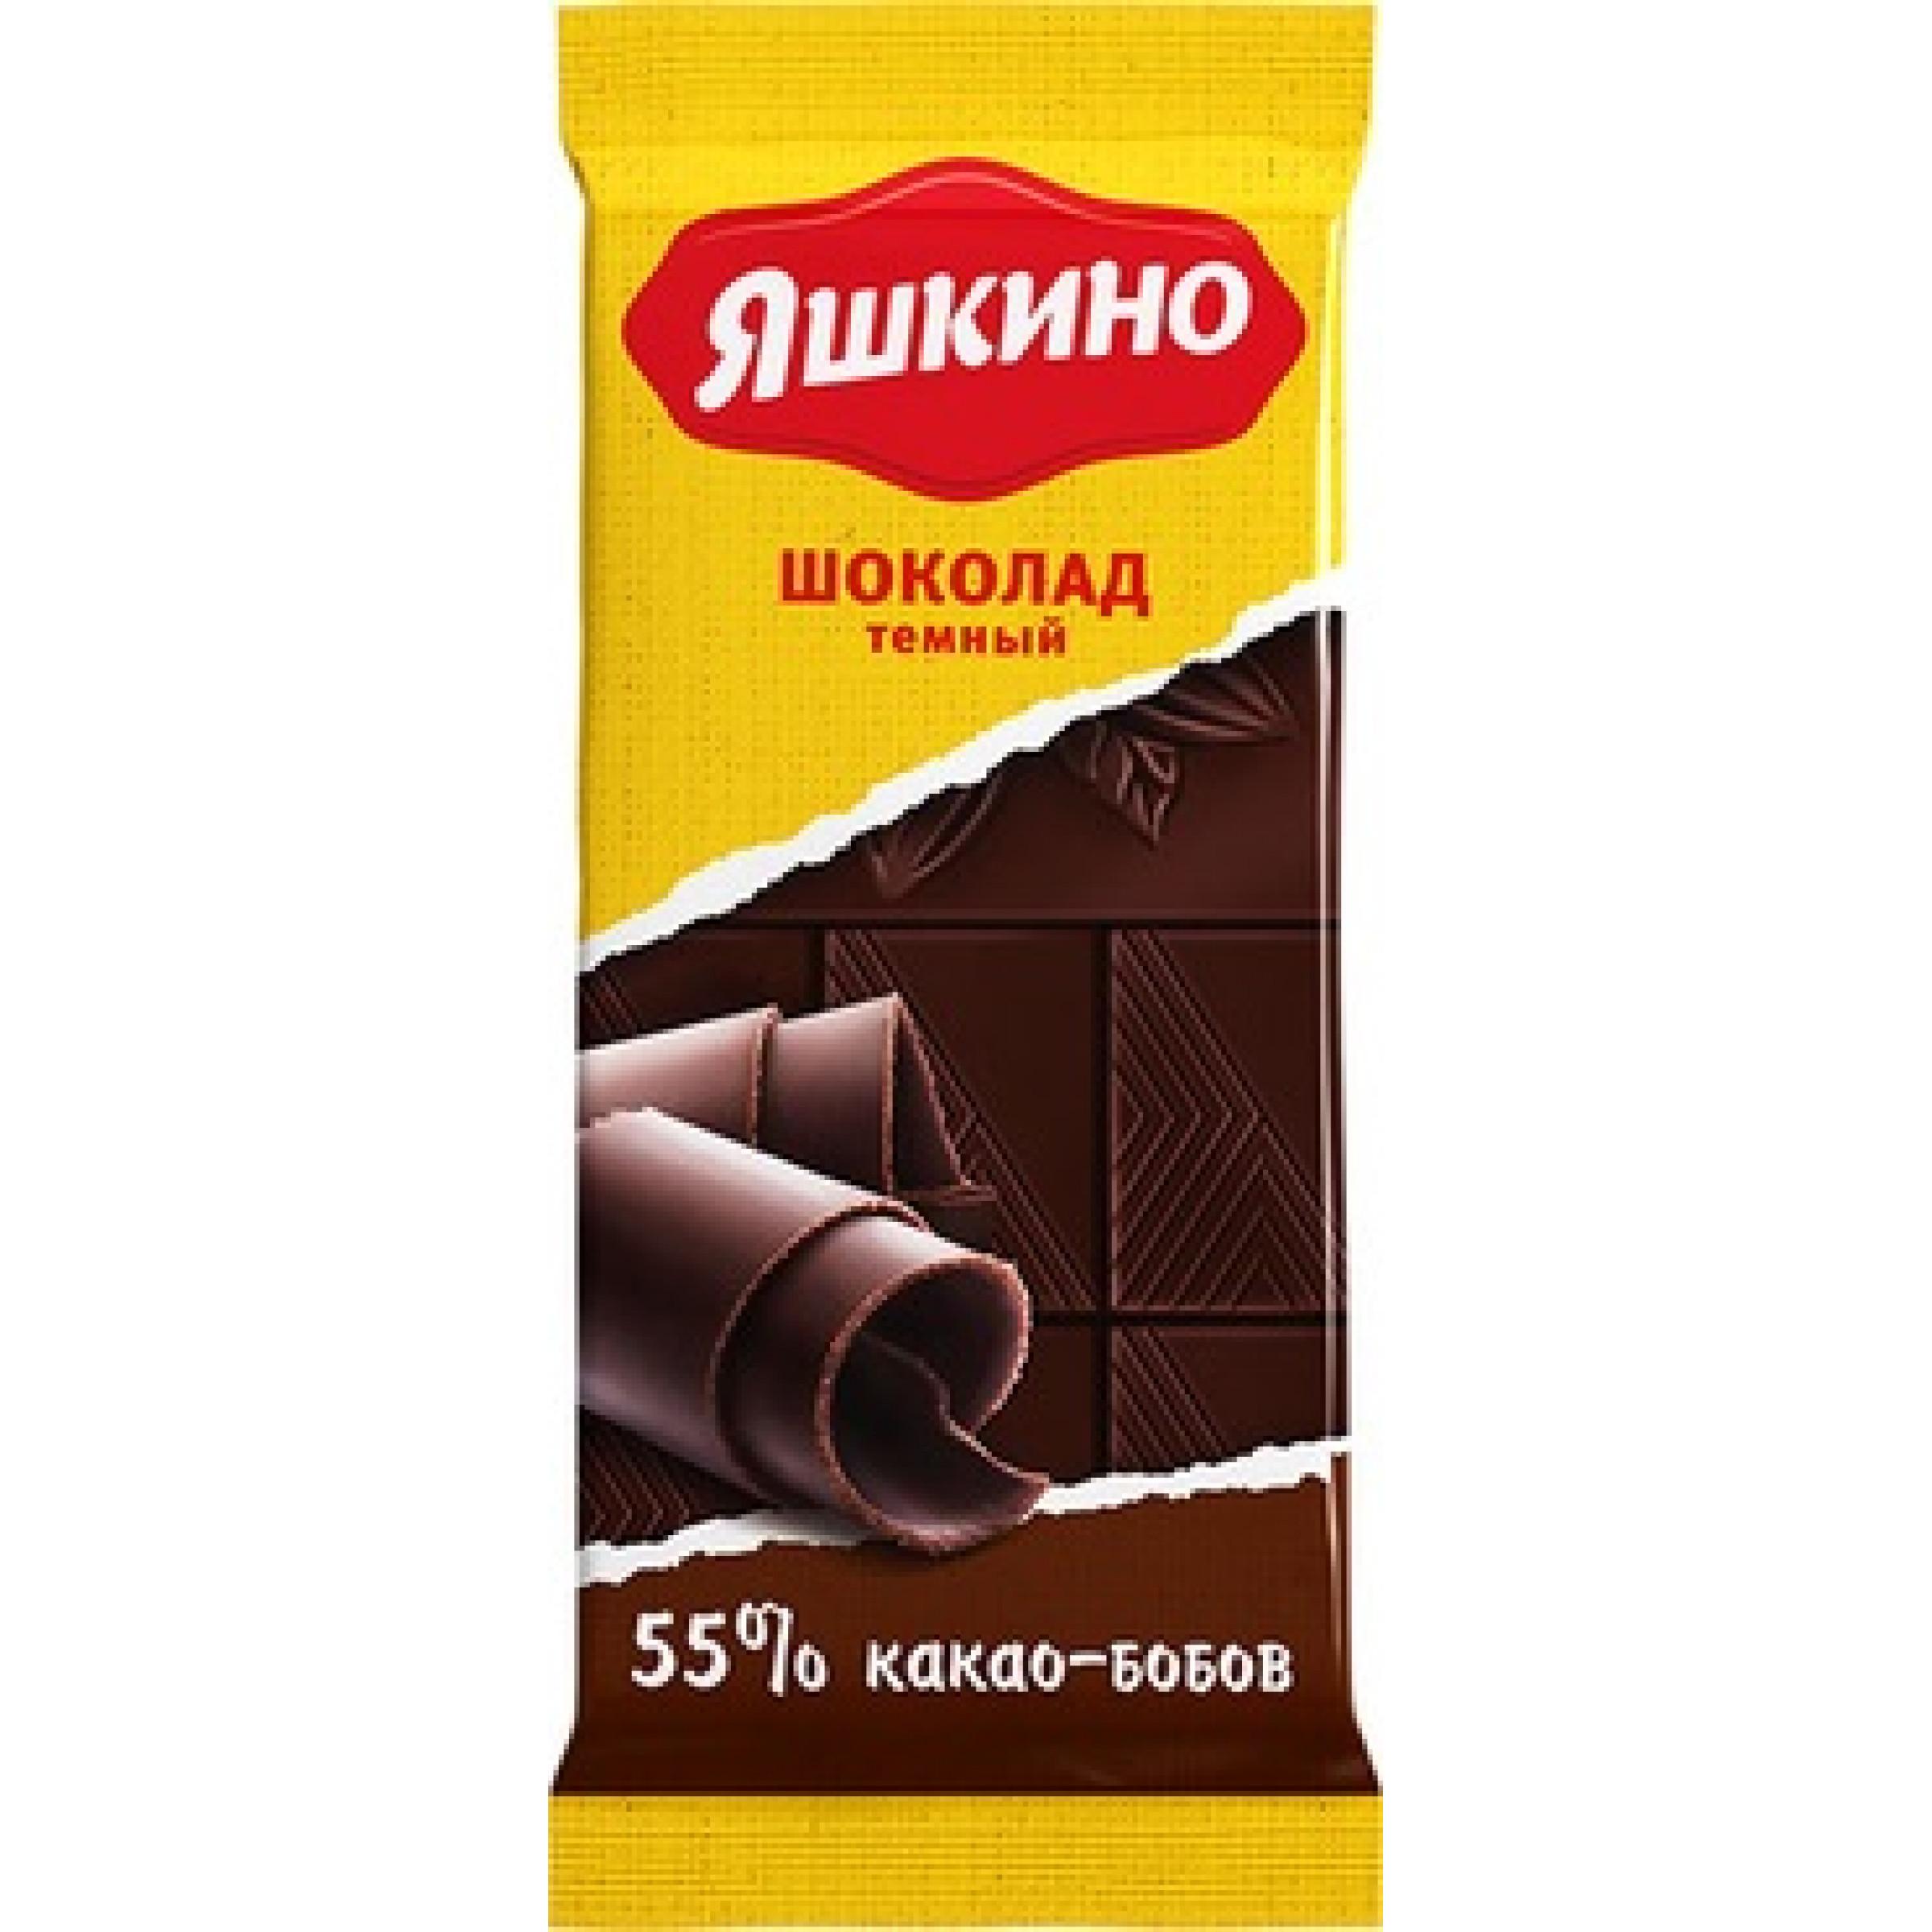 Шоколад Яшкино темный, 90 гр